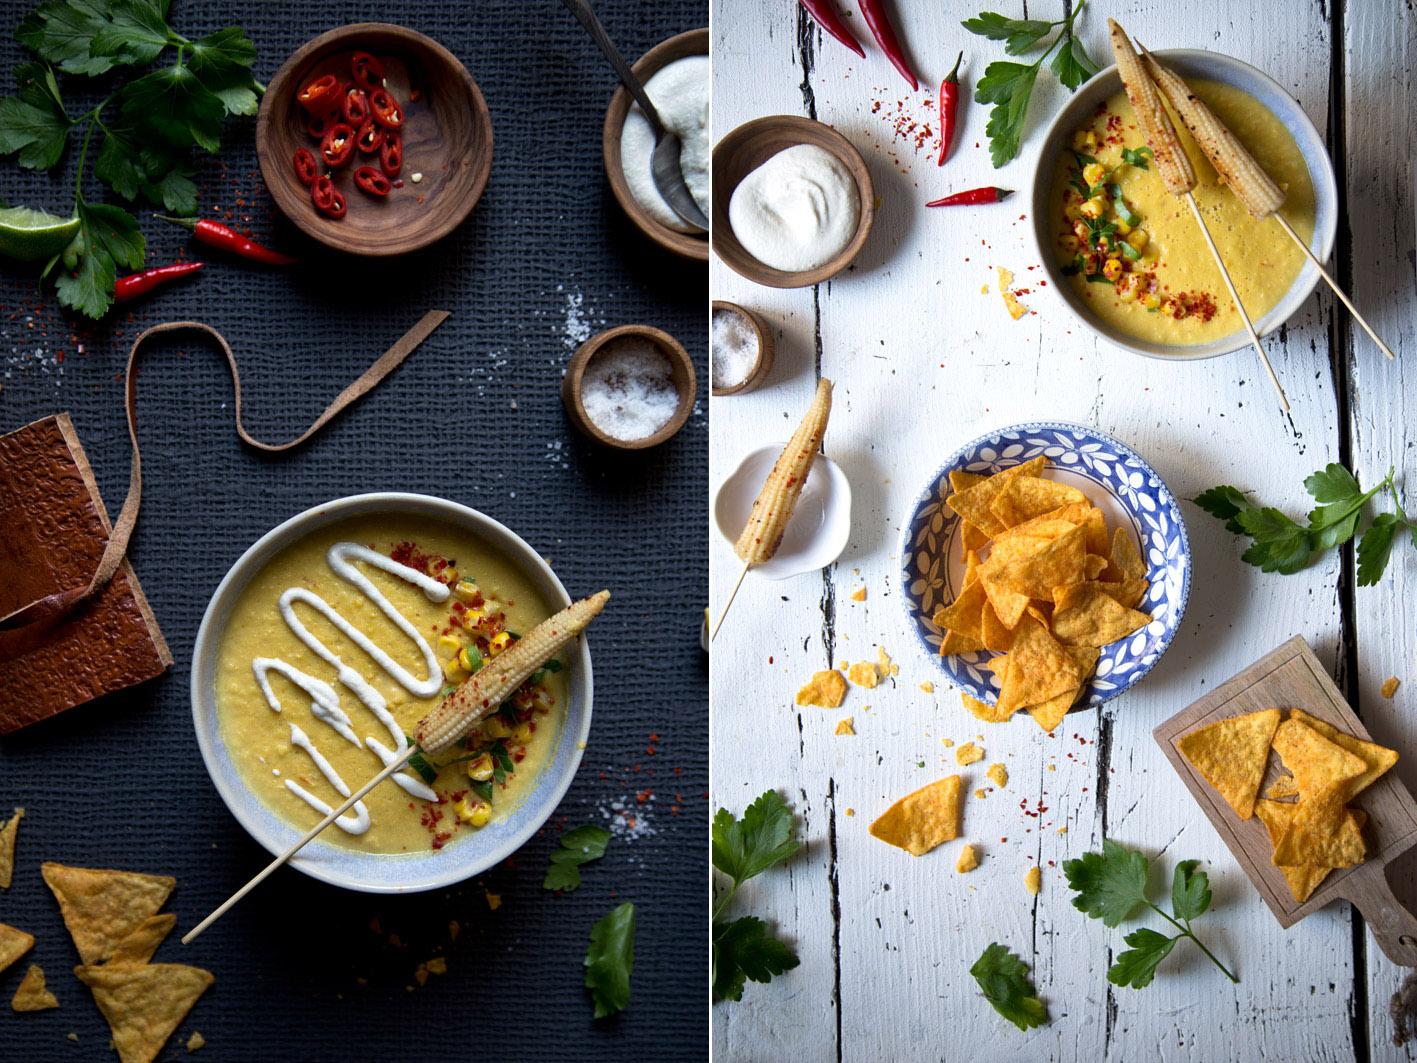 maissuppe mexikanisch